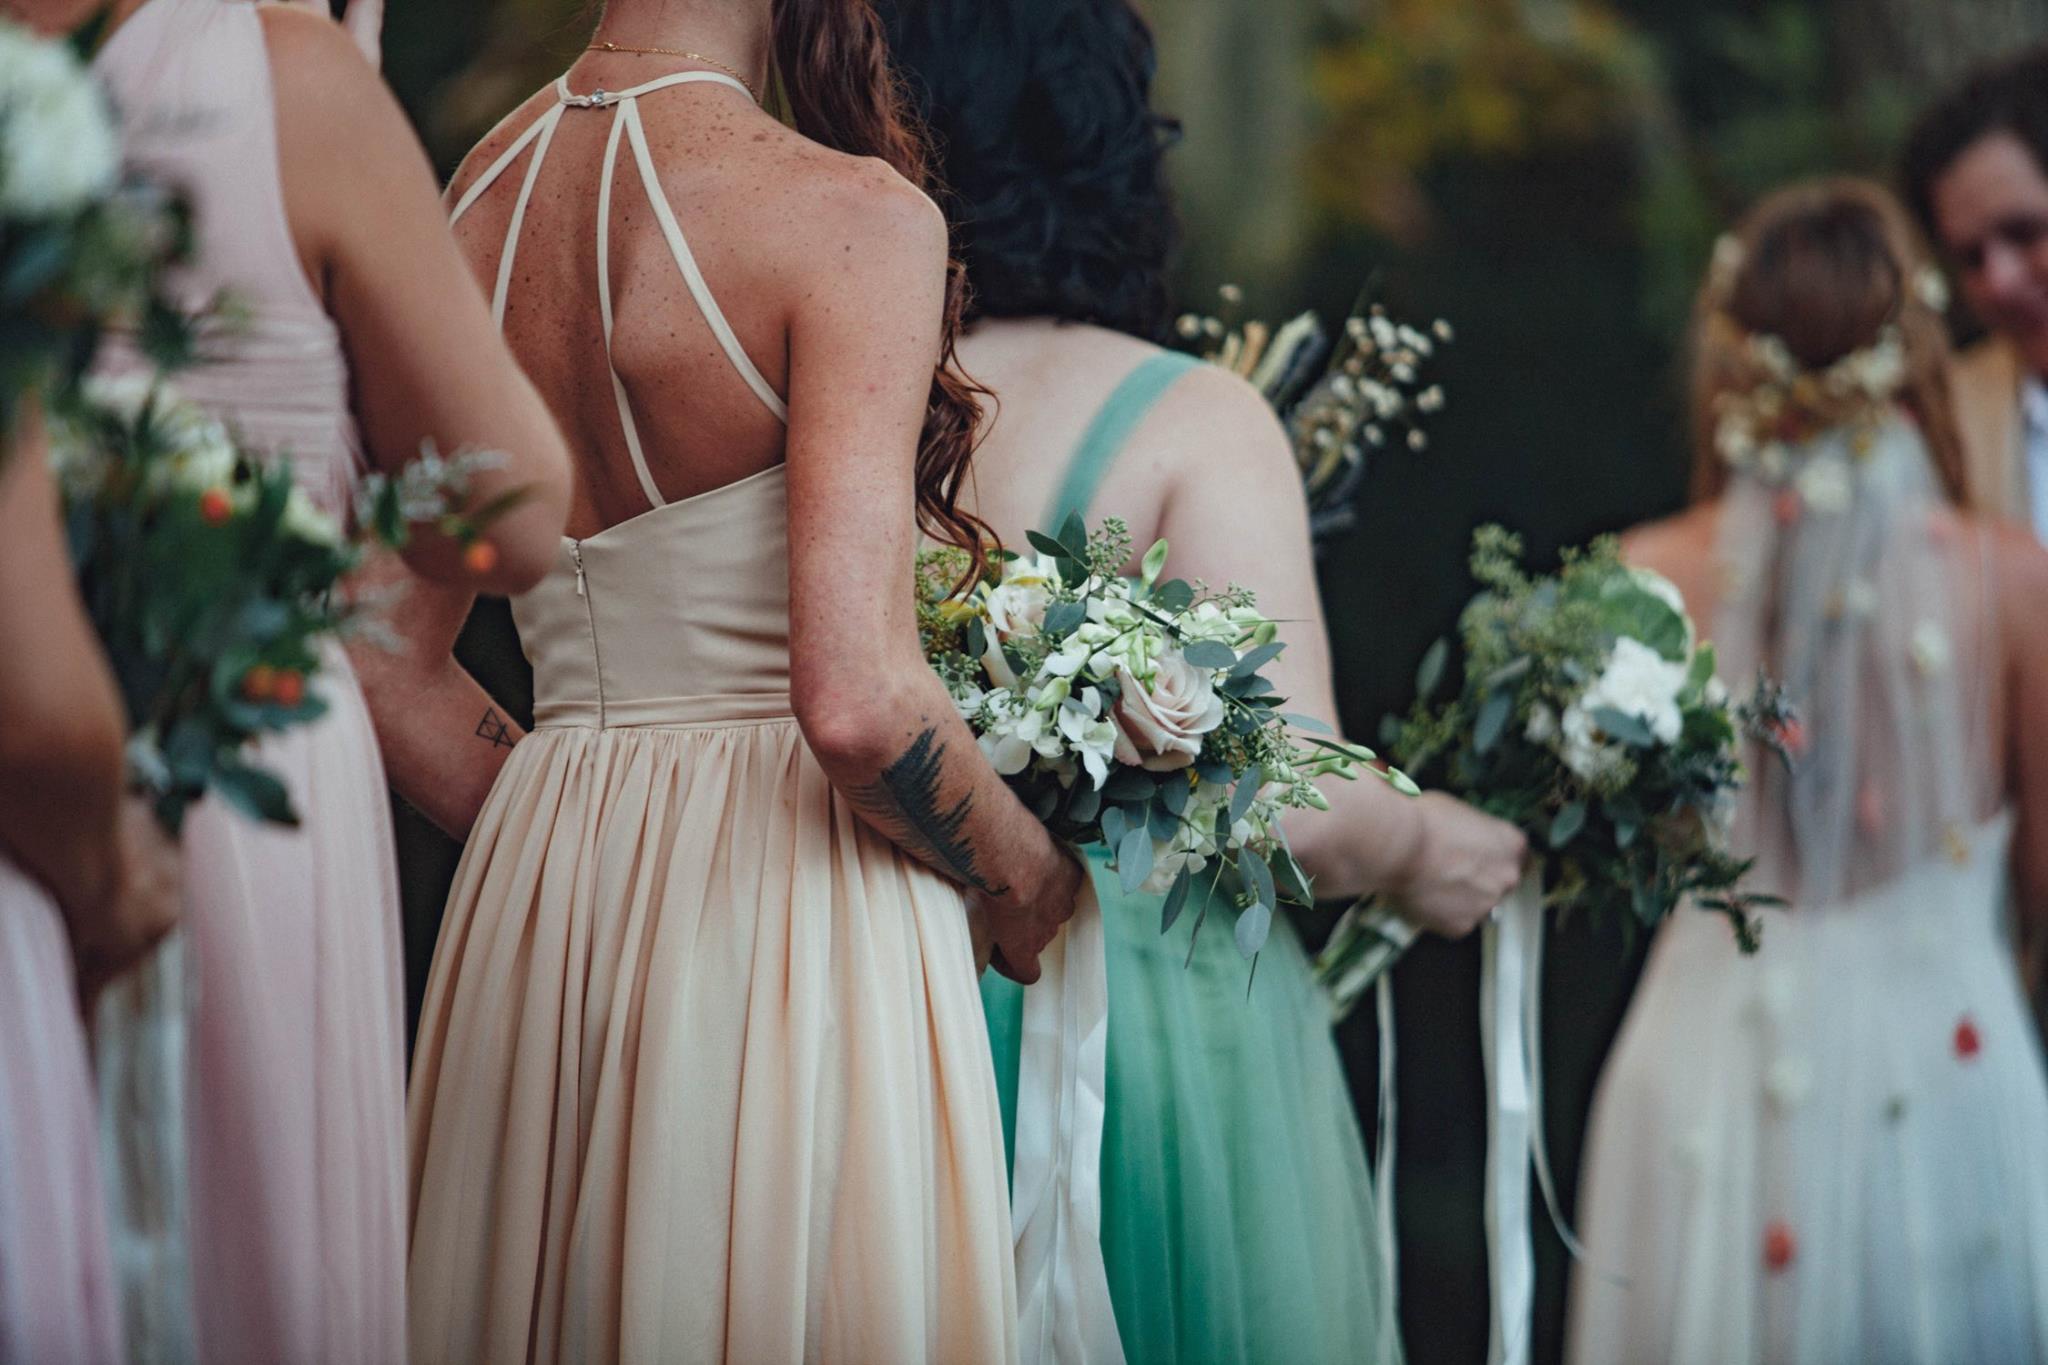 lindy-garvin-rebecca-schoneveld-vivian-sage-blush-wedding-dress-blush-bridal-gown-handmade-wedding-dress-ivory-and-beau-bridal-boutique-savannah-wedding-dresses-savannah-bridal-boutique-savannah-weddings-savannah-brides-jacksonville-bridal-boutique-12.jpg